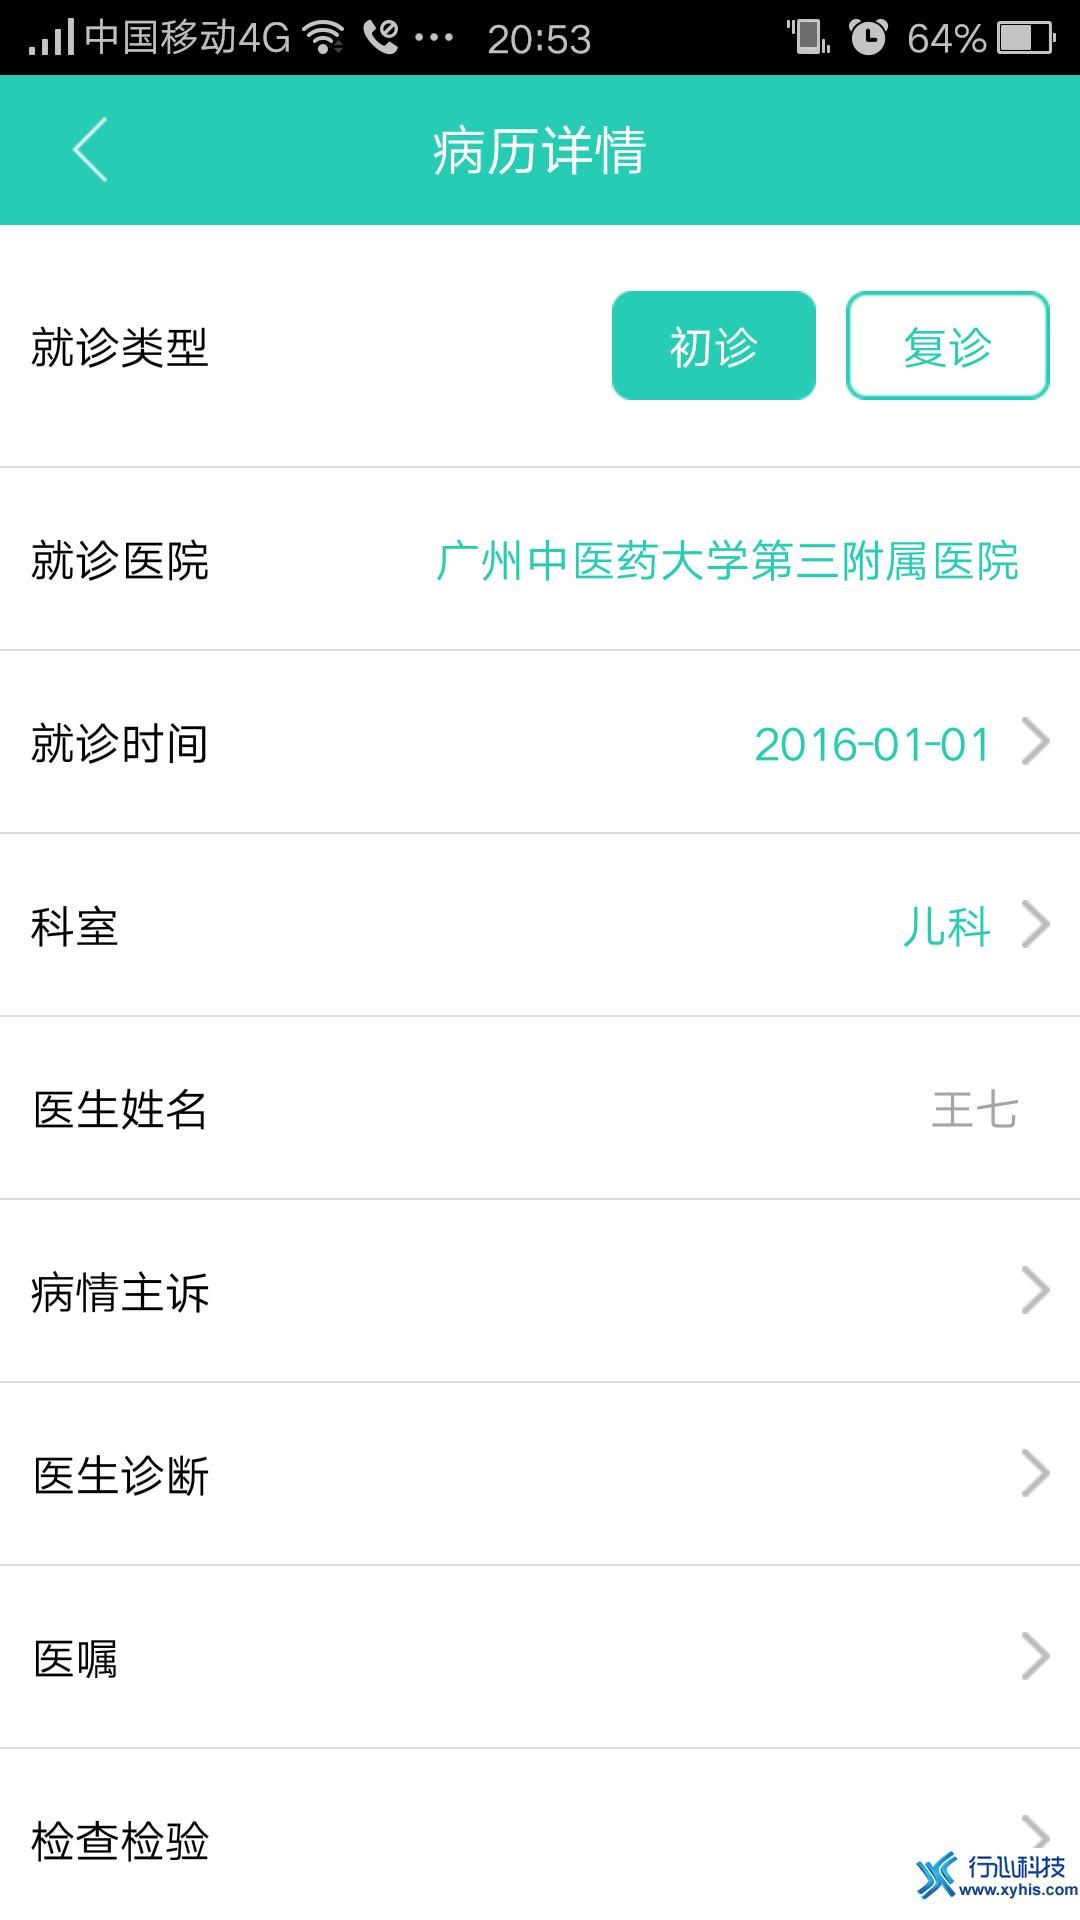 Screenshot_2016-06-23-20-53-08-760.png